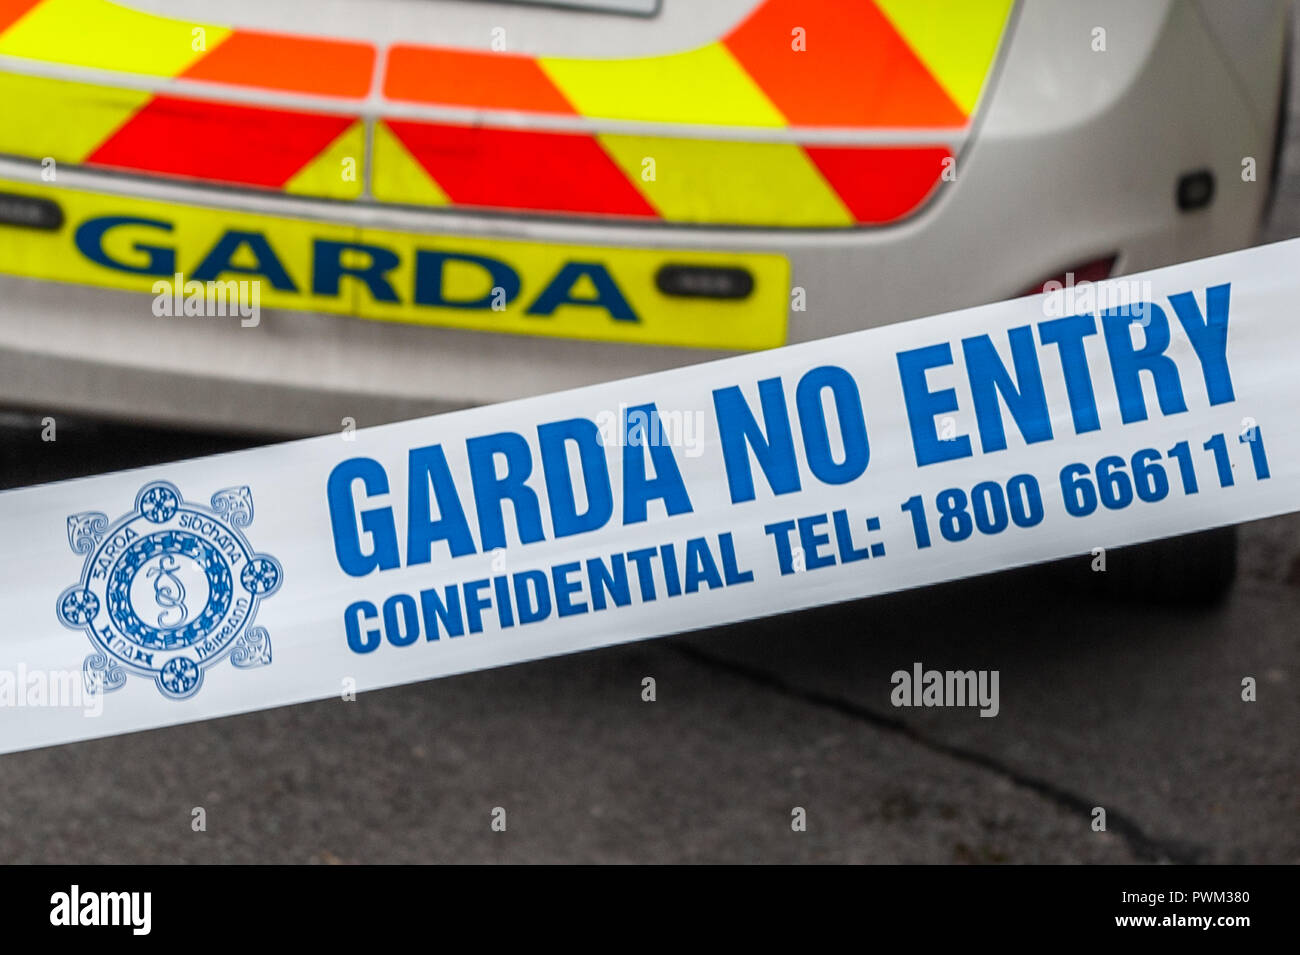 garda-irish-police-no-entry-tape-in-front-of-a-garda-patrol-car-at-an-incident-in-ireland-PWM380.jpg